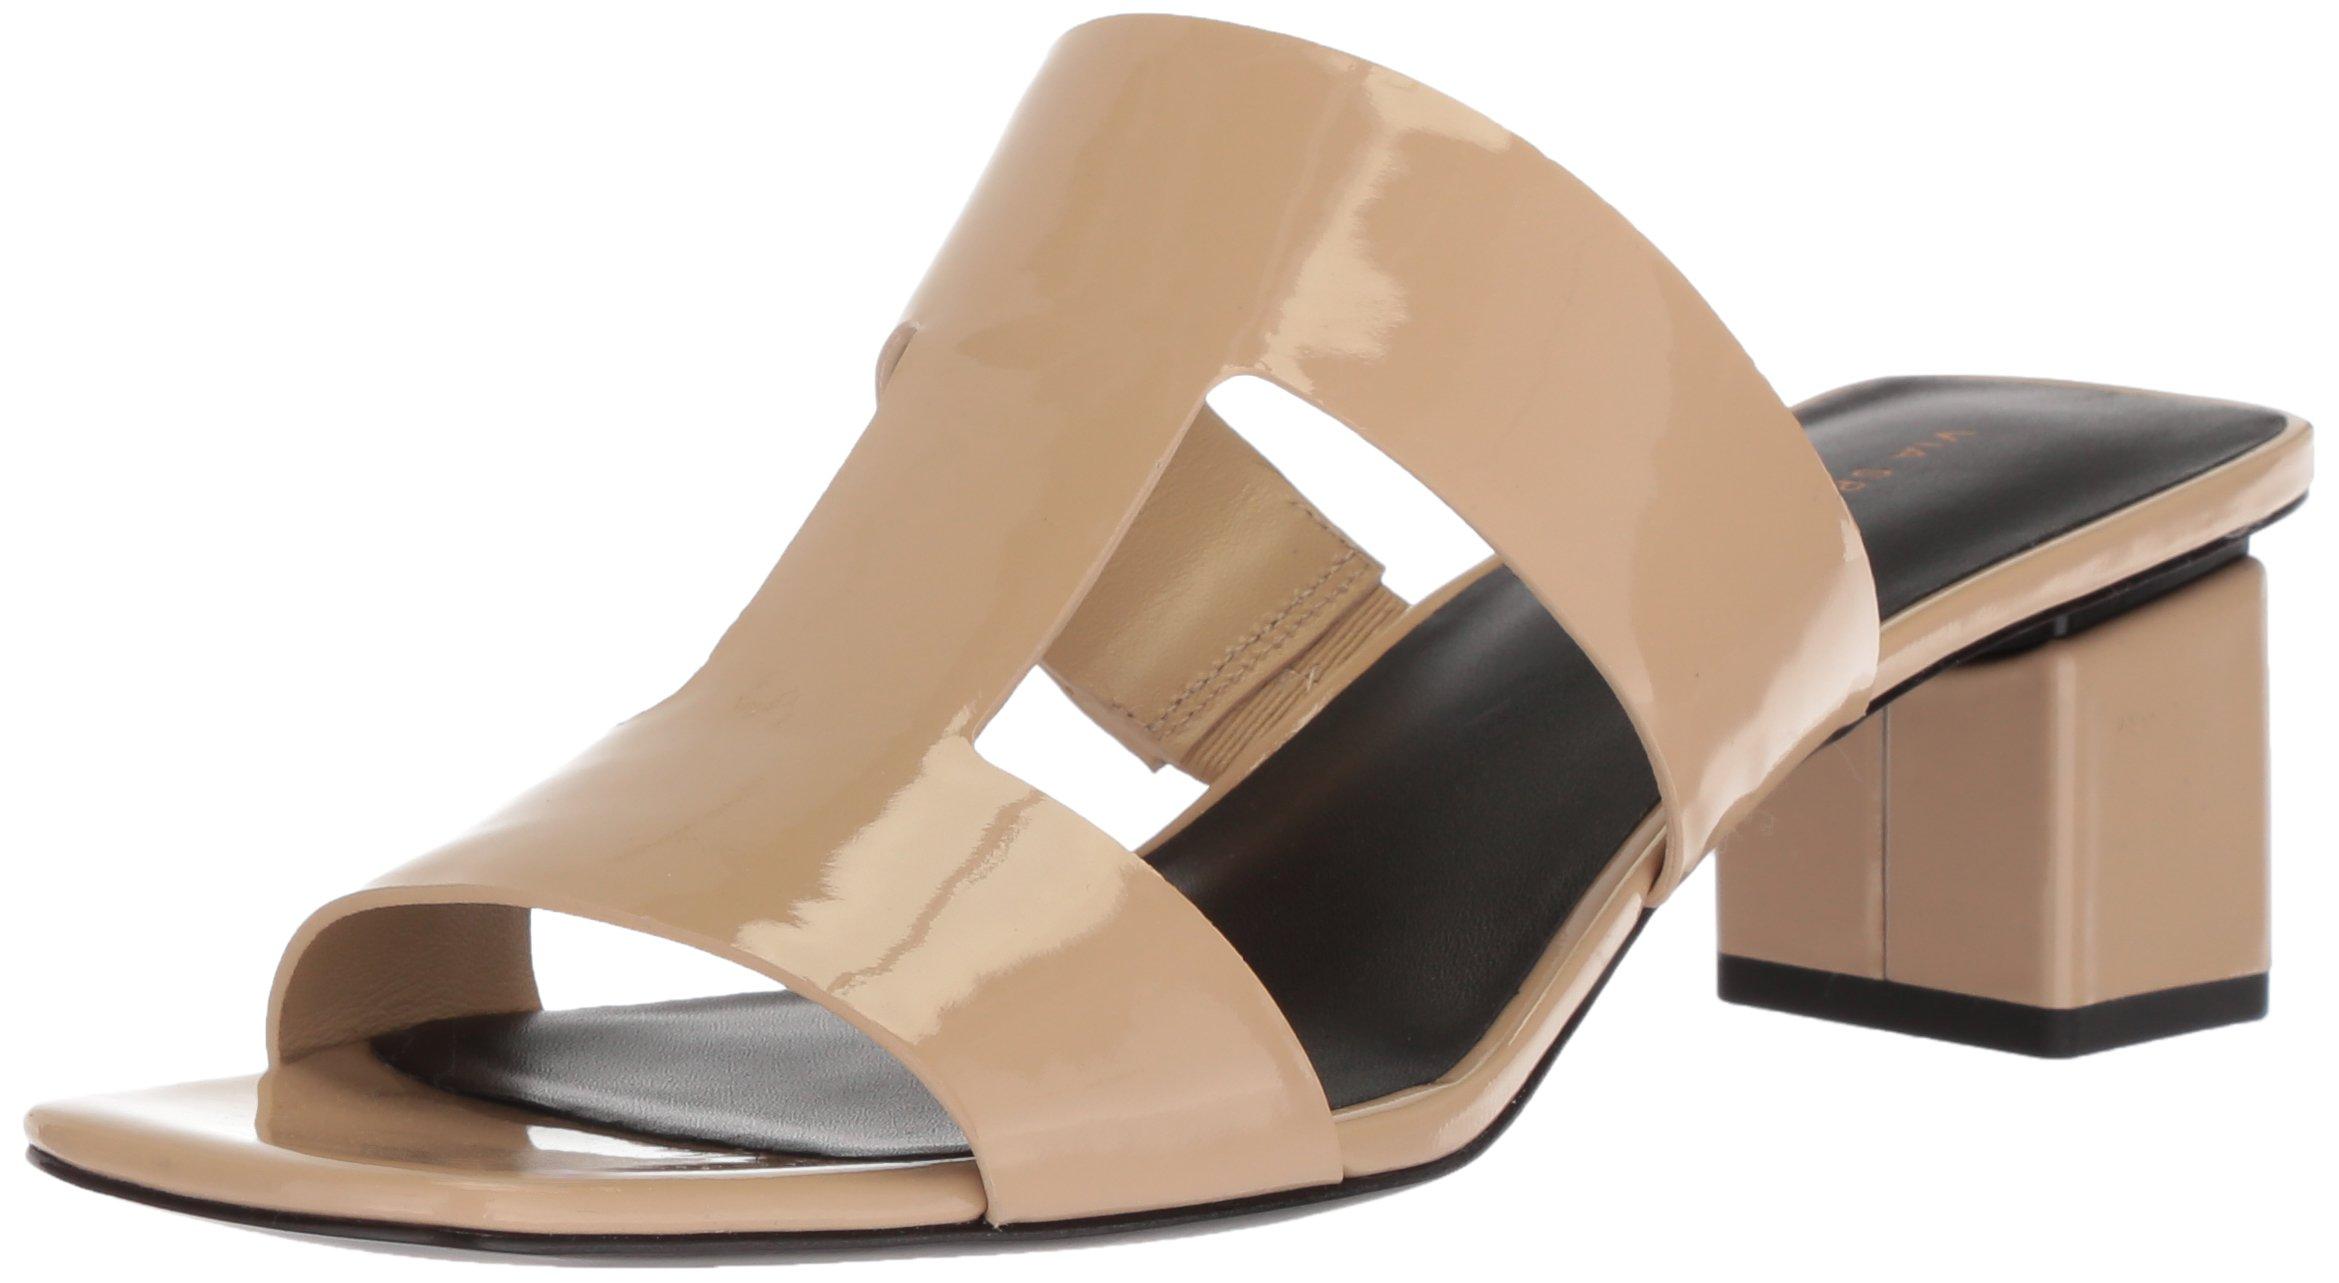 Via Spiga Women's Florence Block Heel Slide Sandal, Sand Patent, 7.5 Medium US